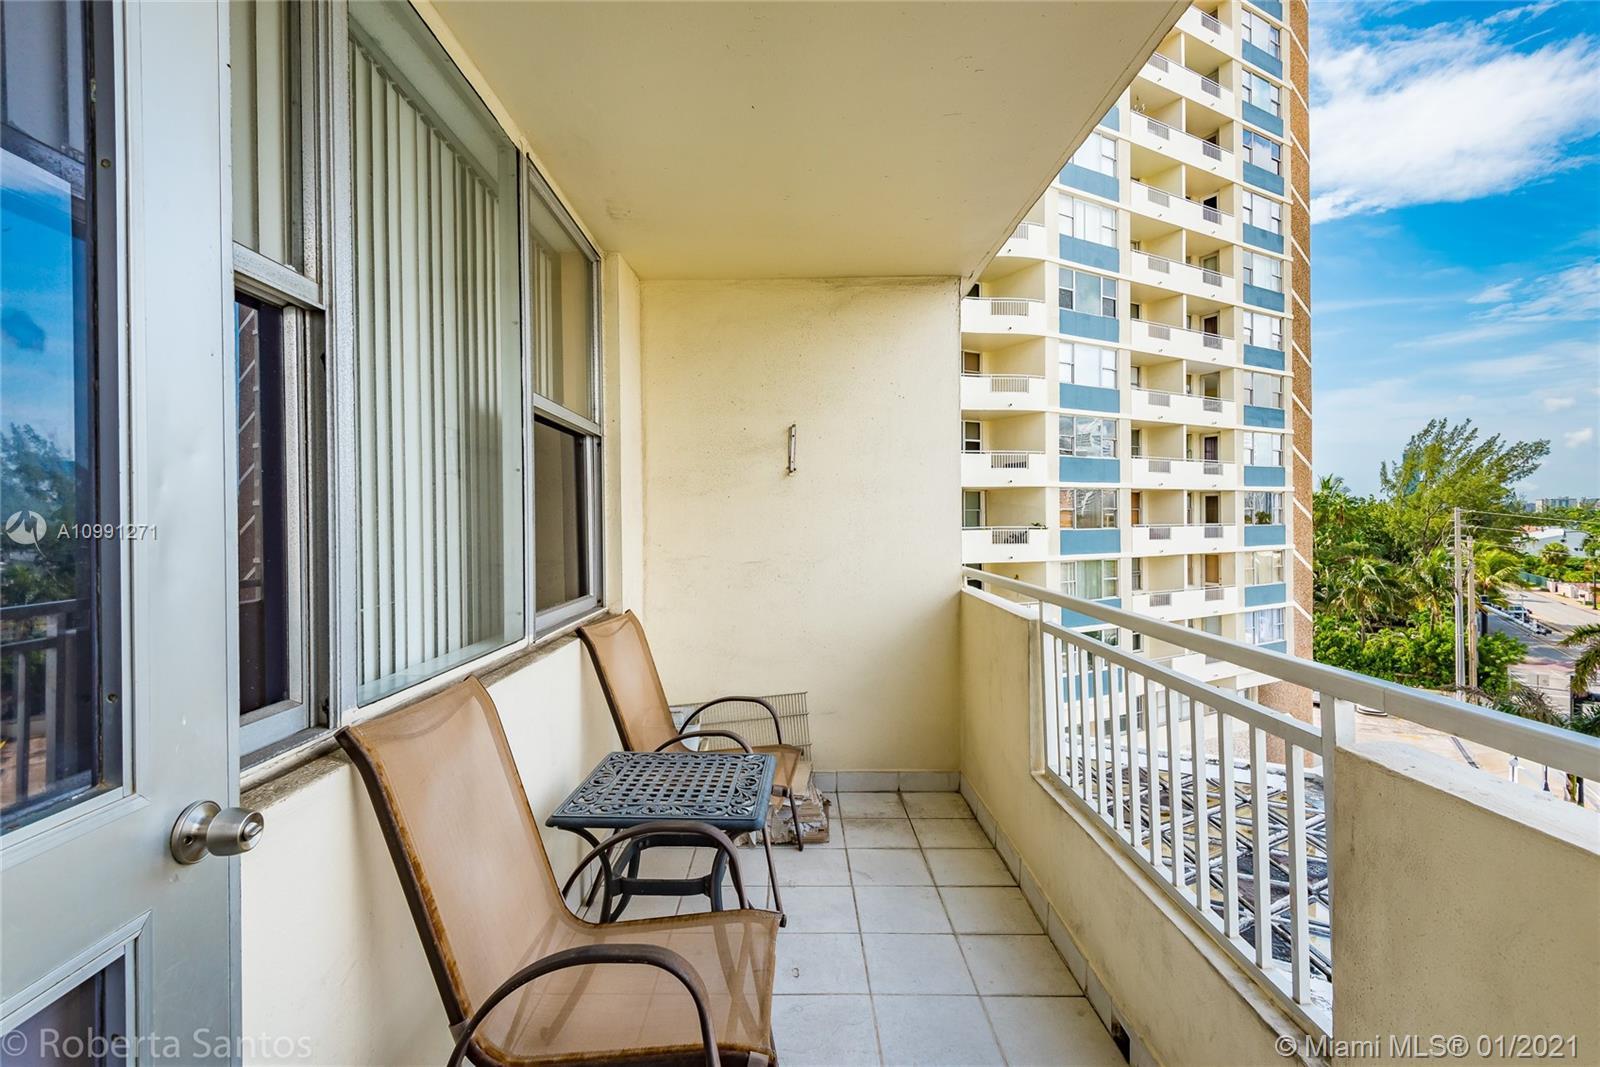 Parker Dorado #422 - 3180 S Ocean Dr #422, Hallandale Beach, FL 33009